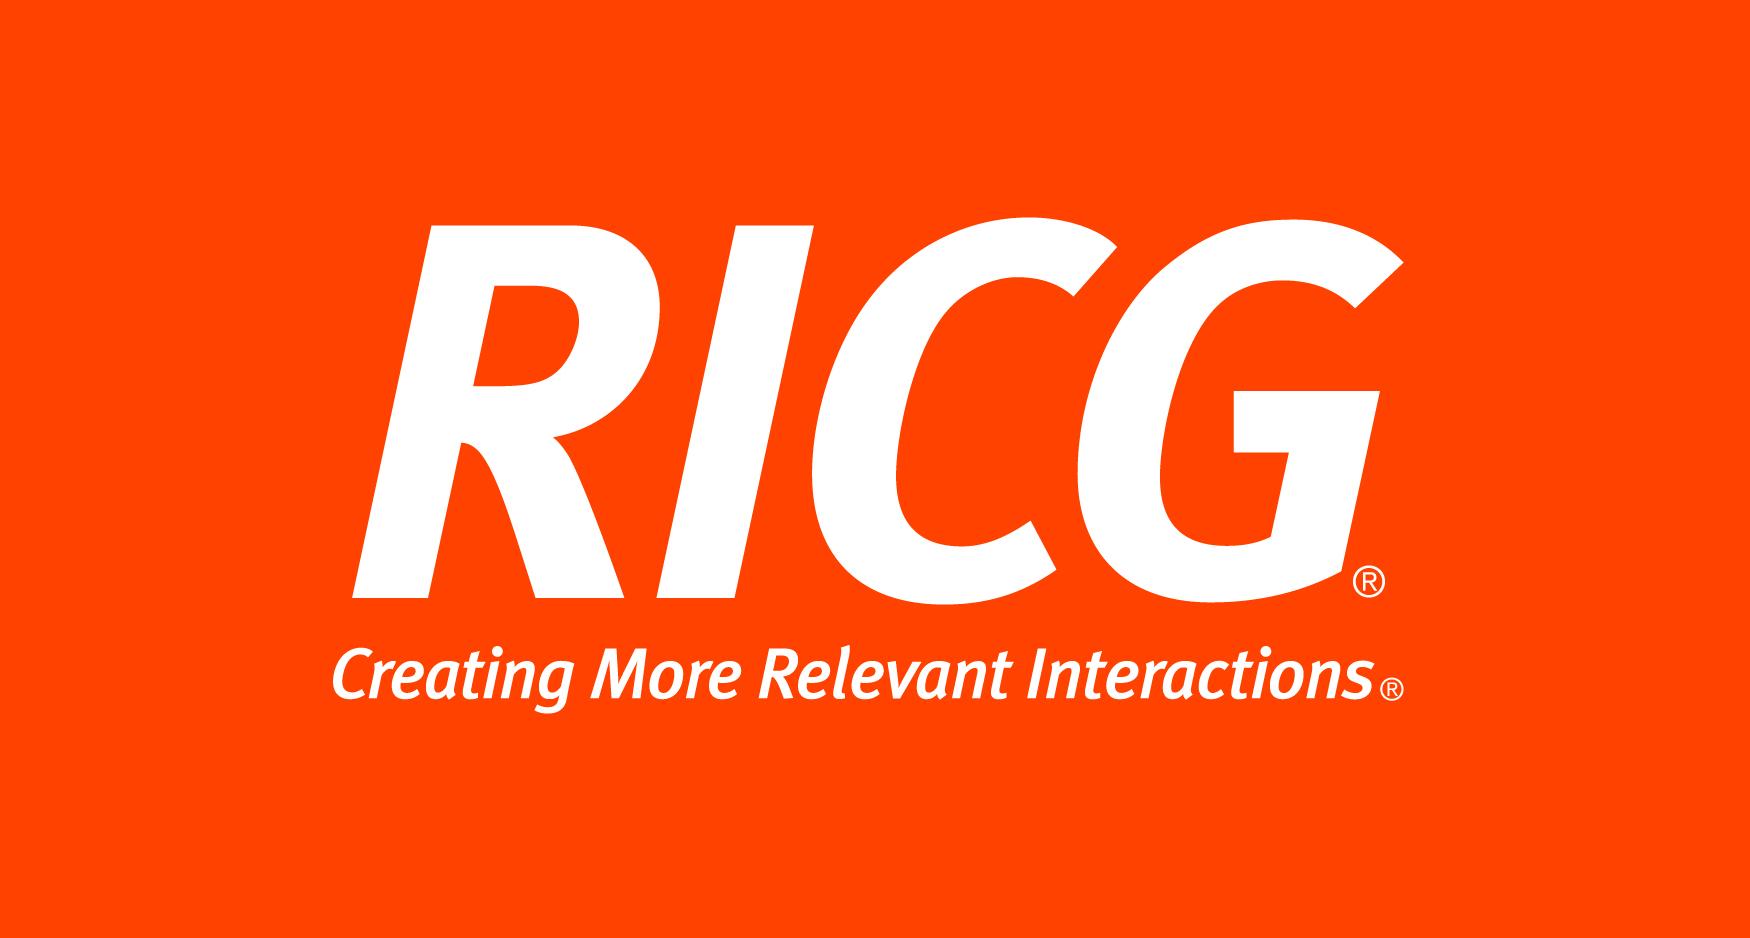 1 RICG Logo - RICG - REPOSITIONING & REBRANDING